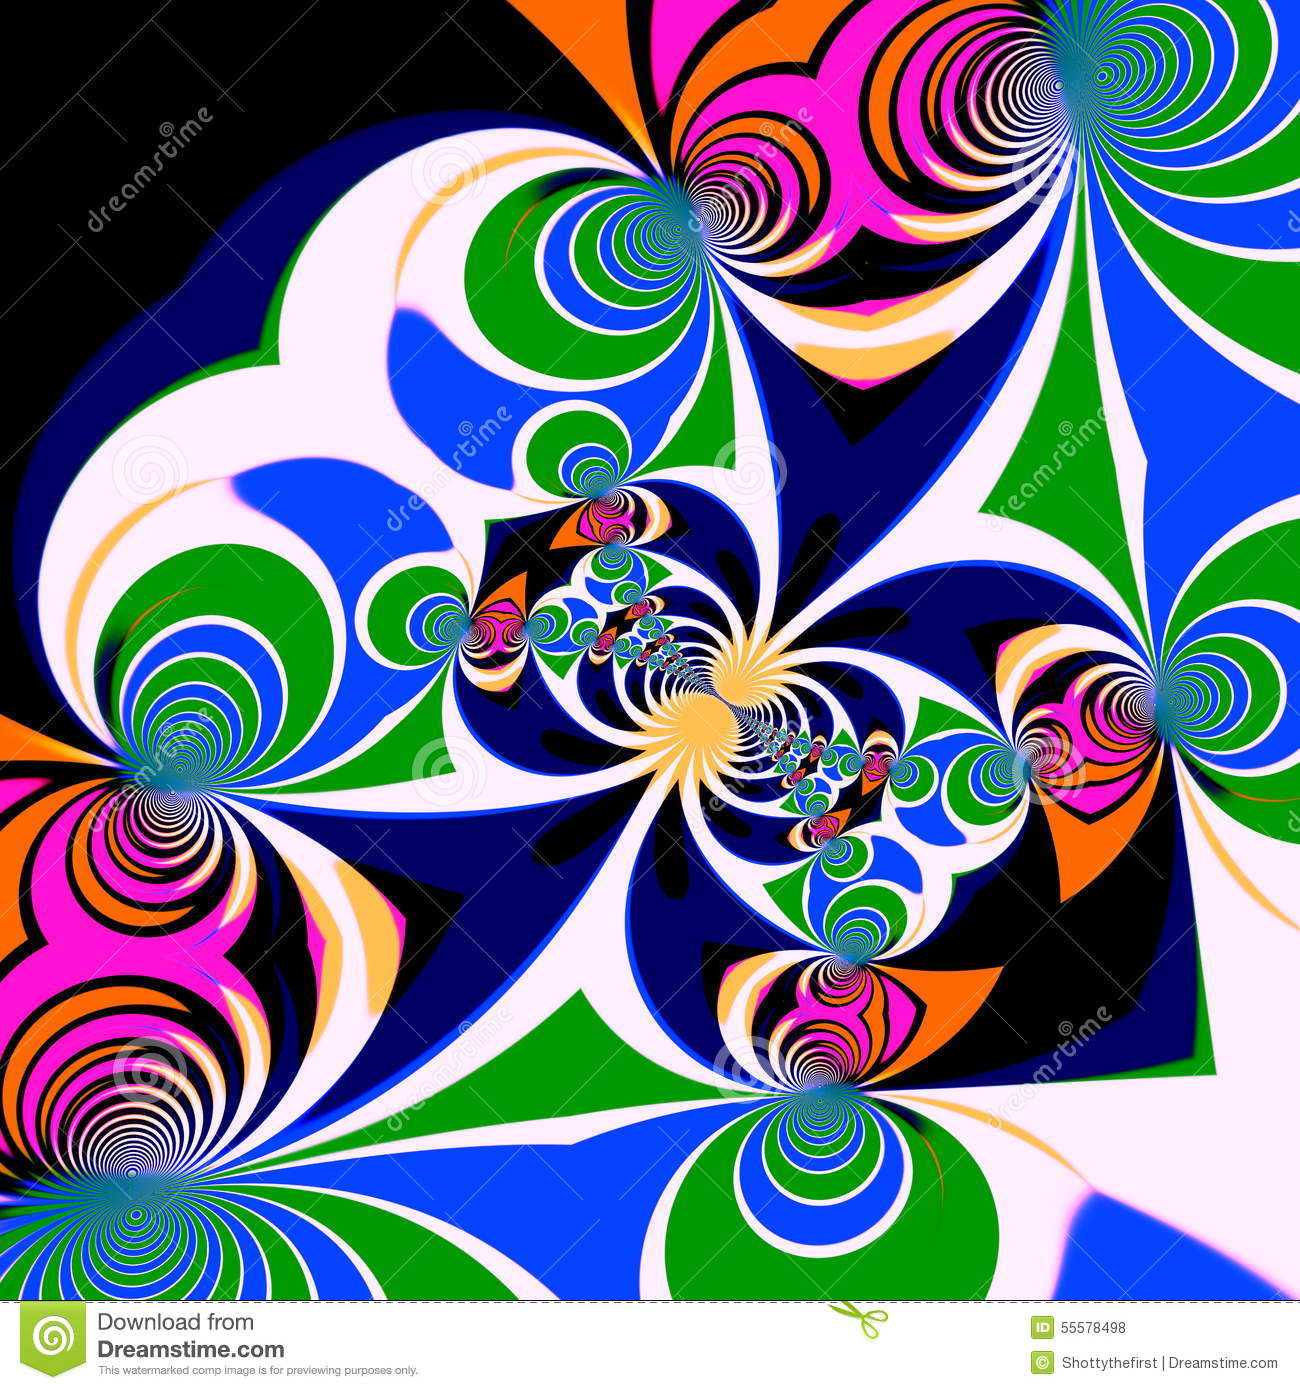 Psychedelic Style Background. Illustration Design. Symmetrical.